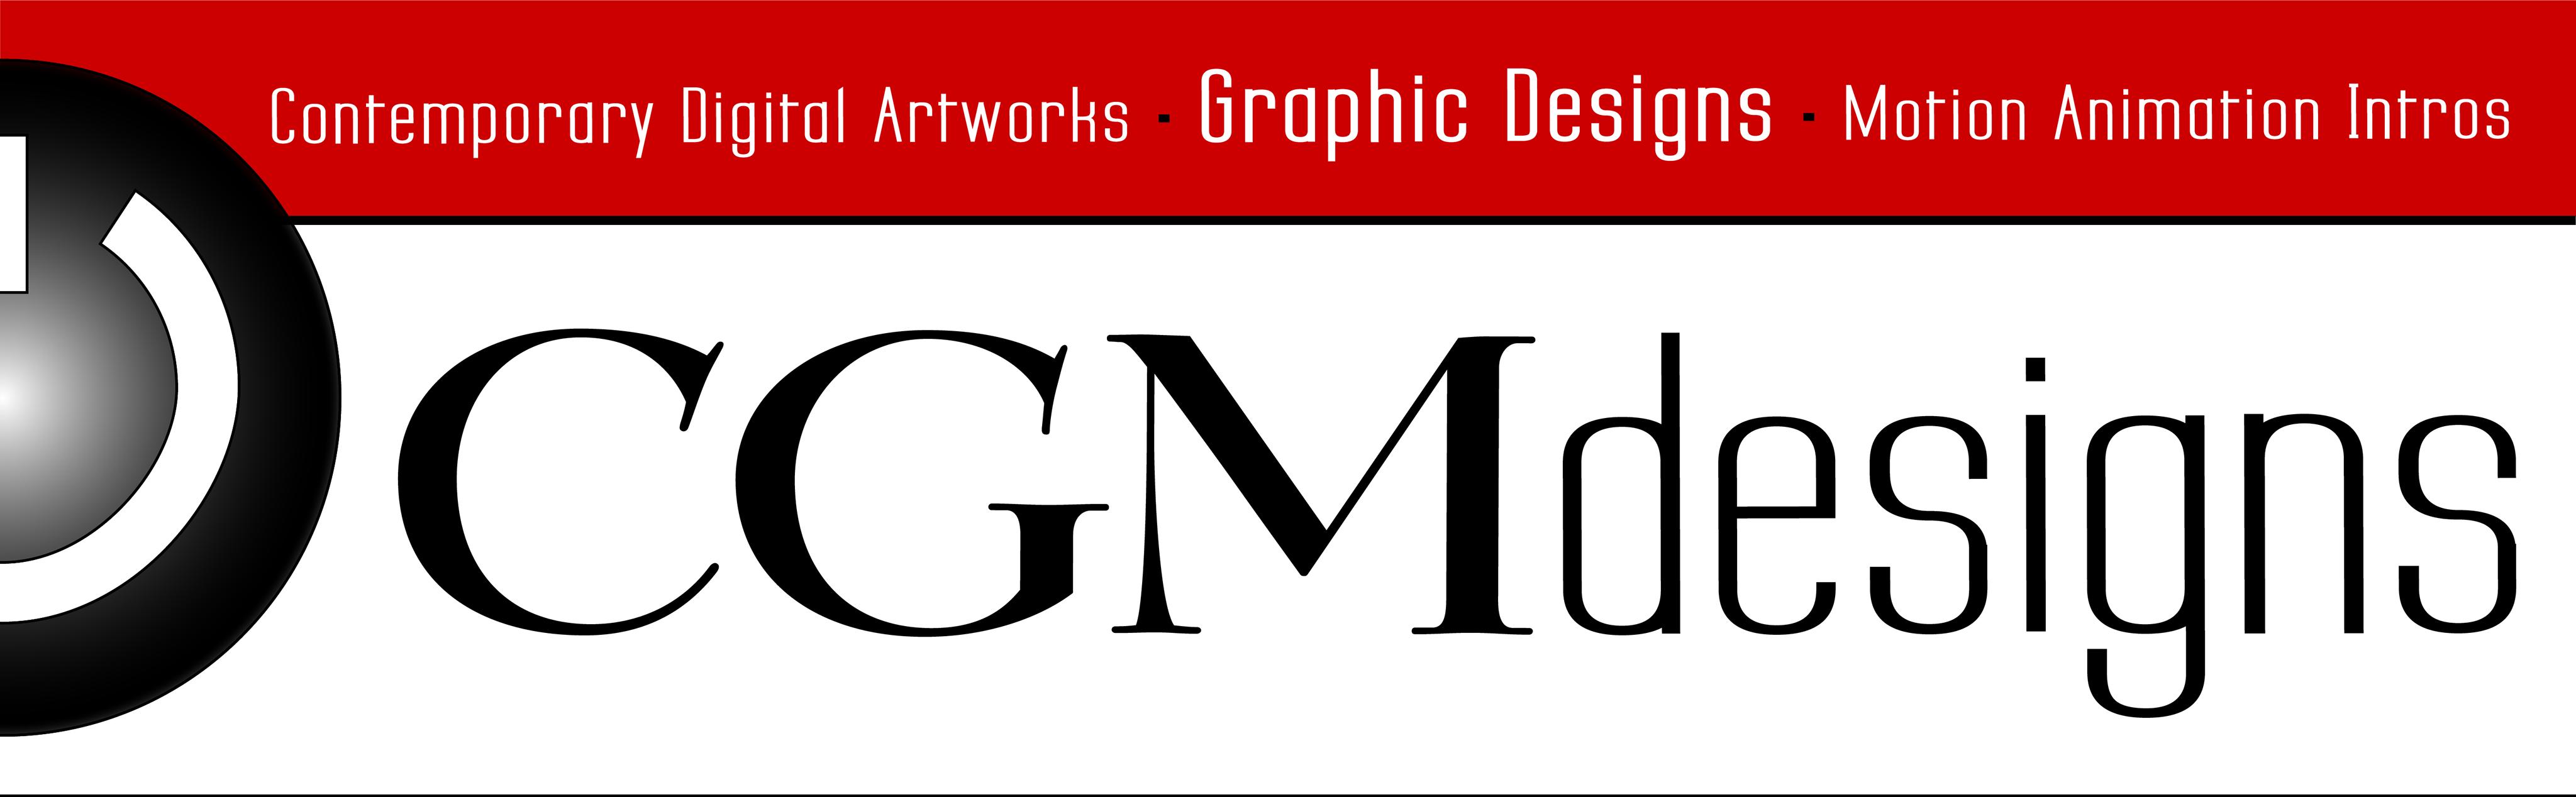 CGM DESIGNS